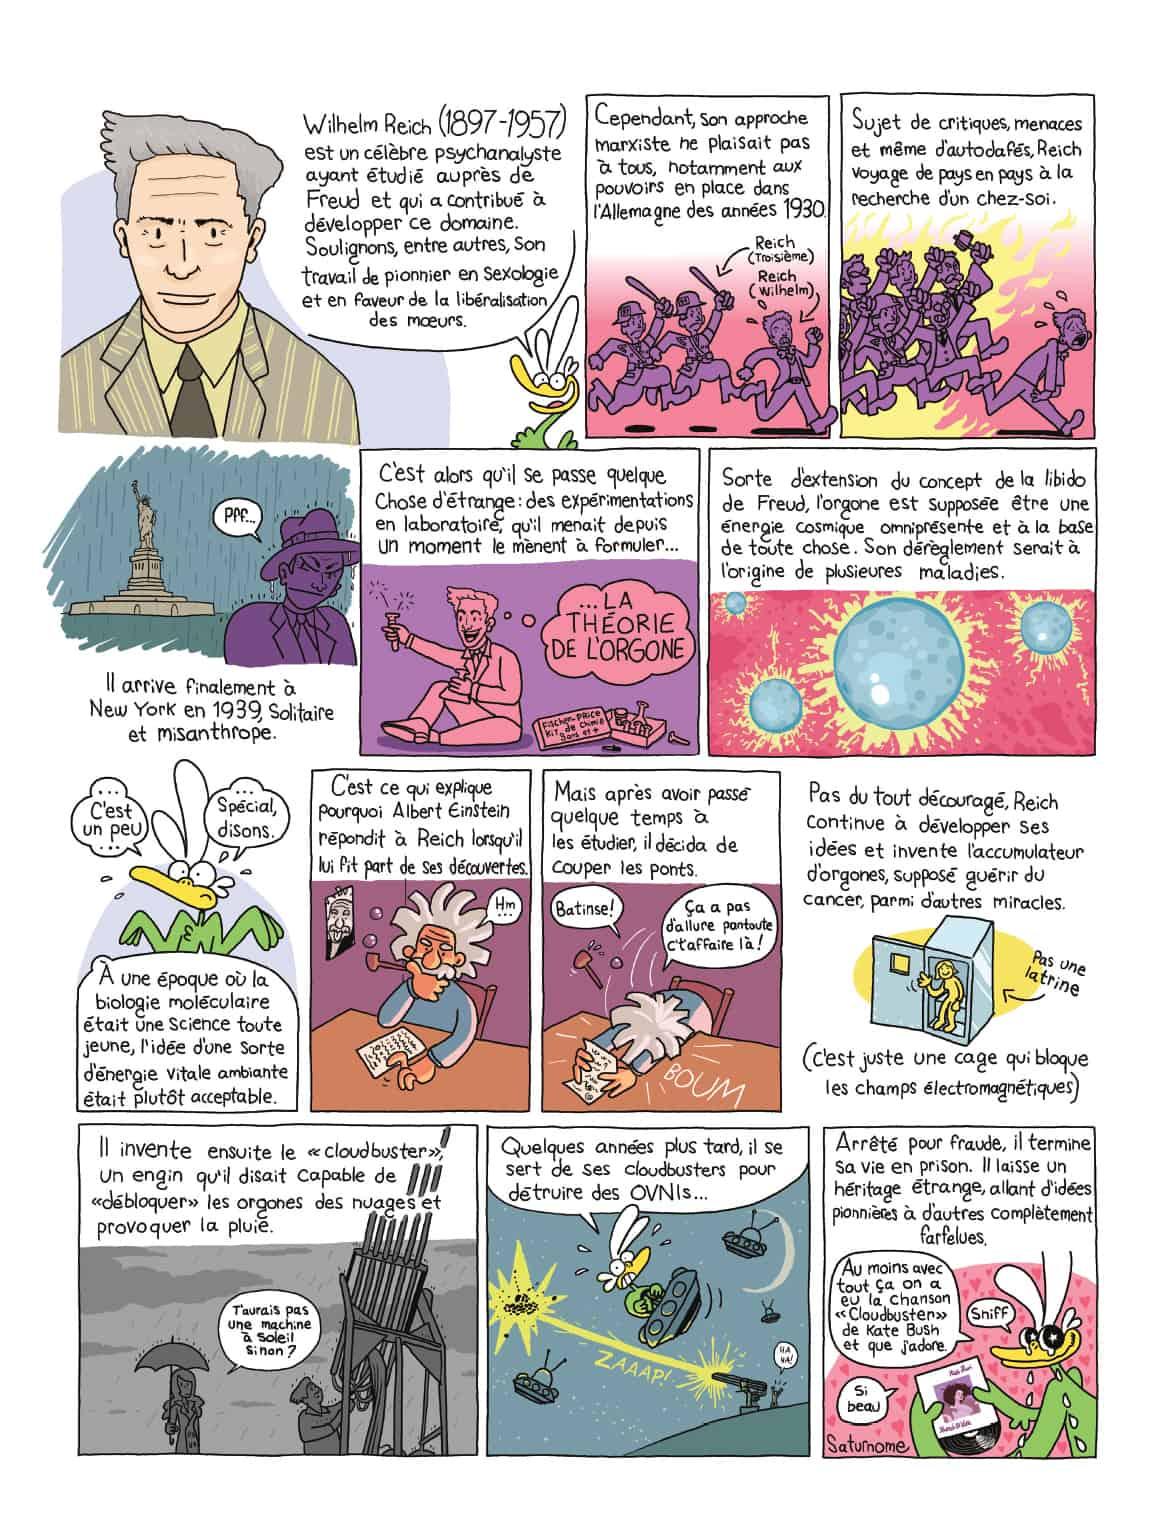 Bande dessinée de Saturnome, Québec Science, juillet-août 2017